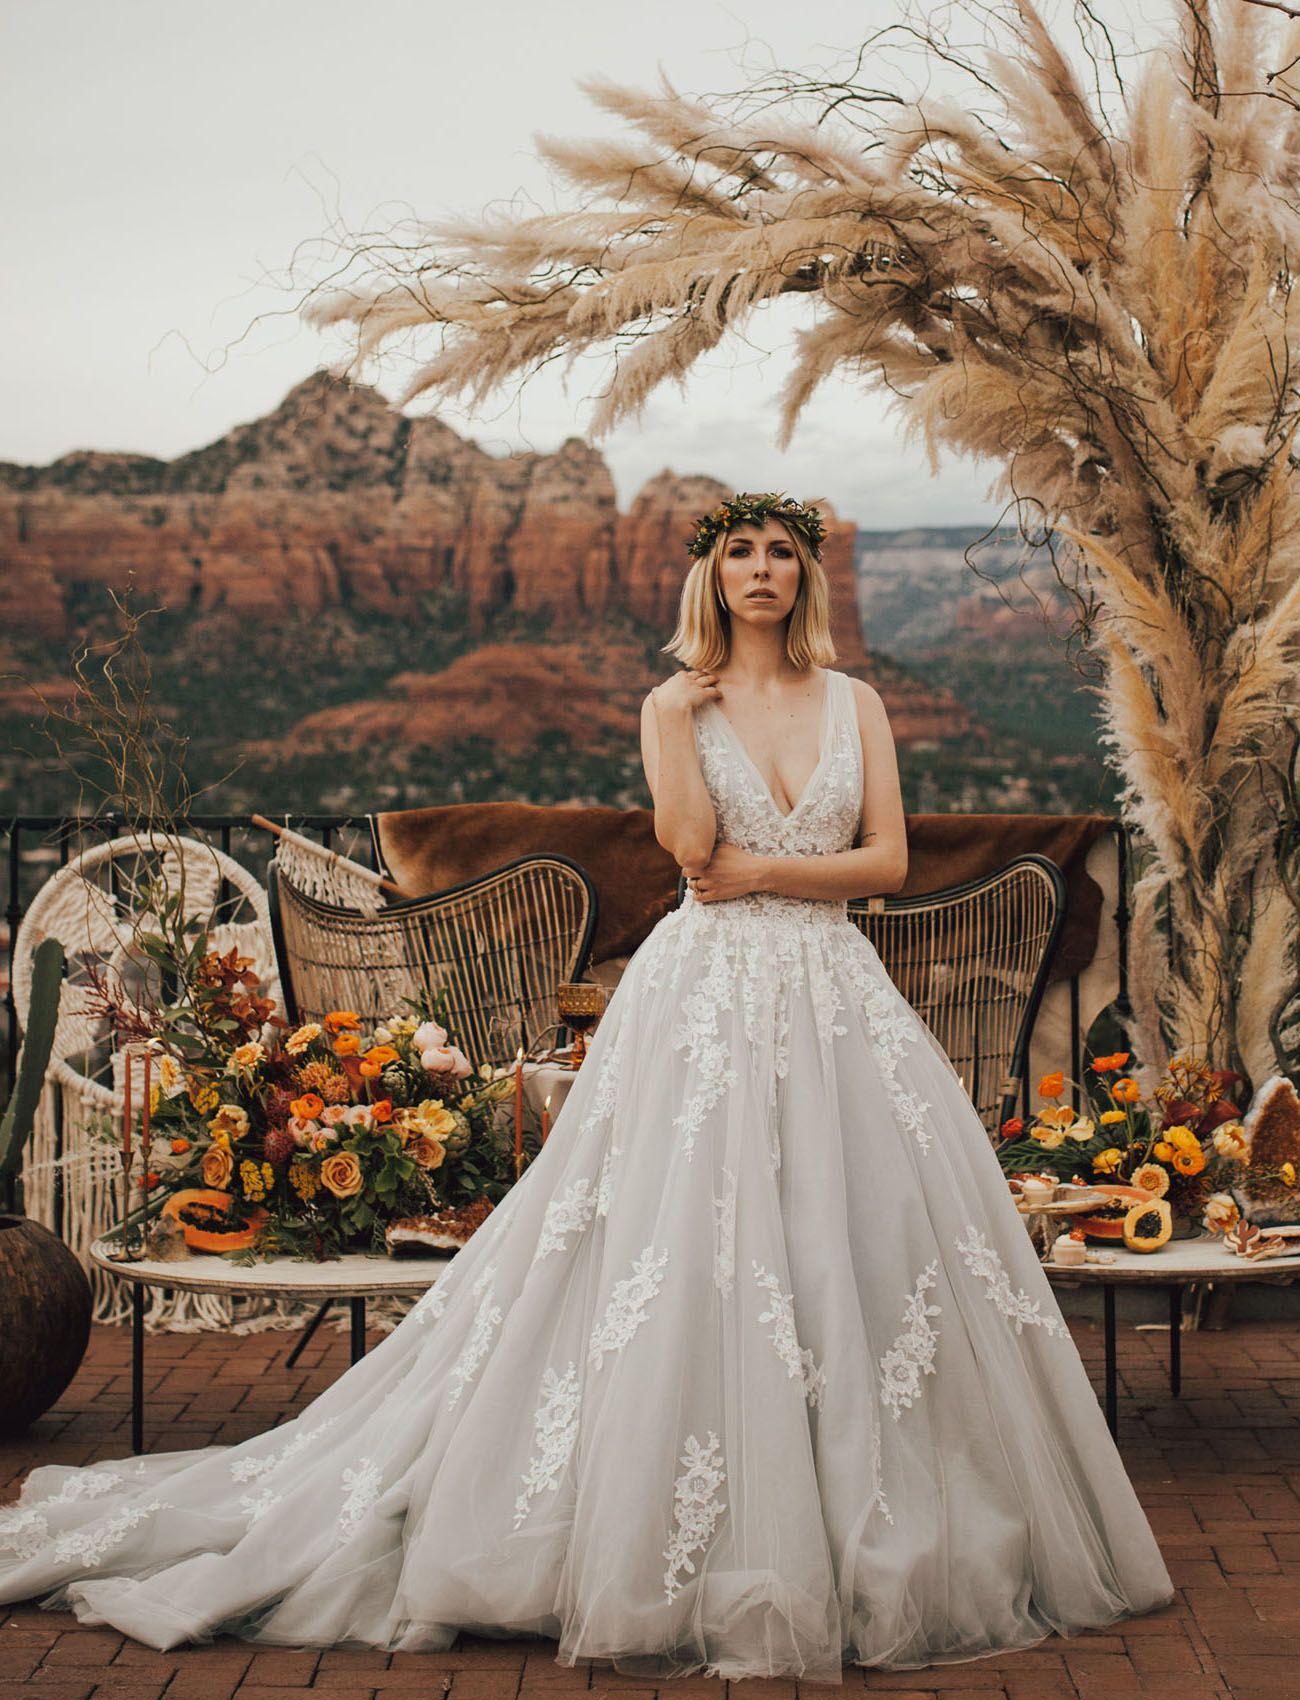 Smoky Citrine Crystals In This Sedona Wedding Inspiration Sedona